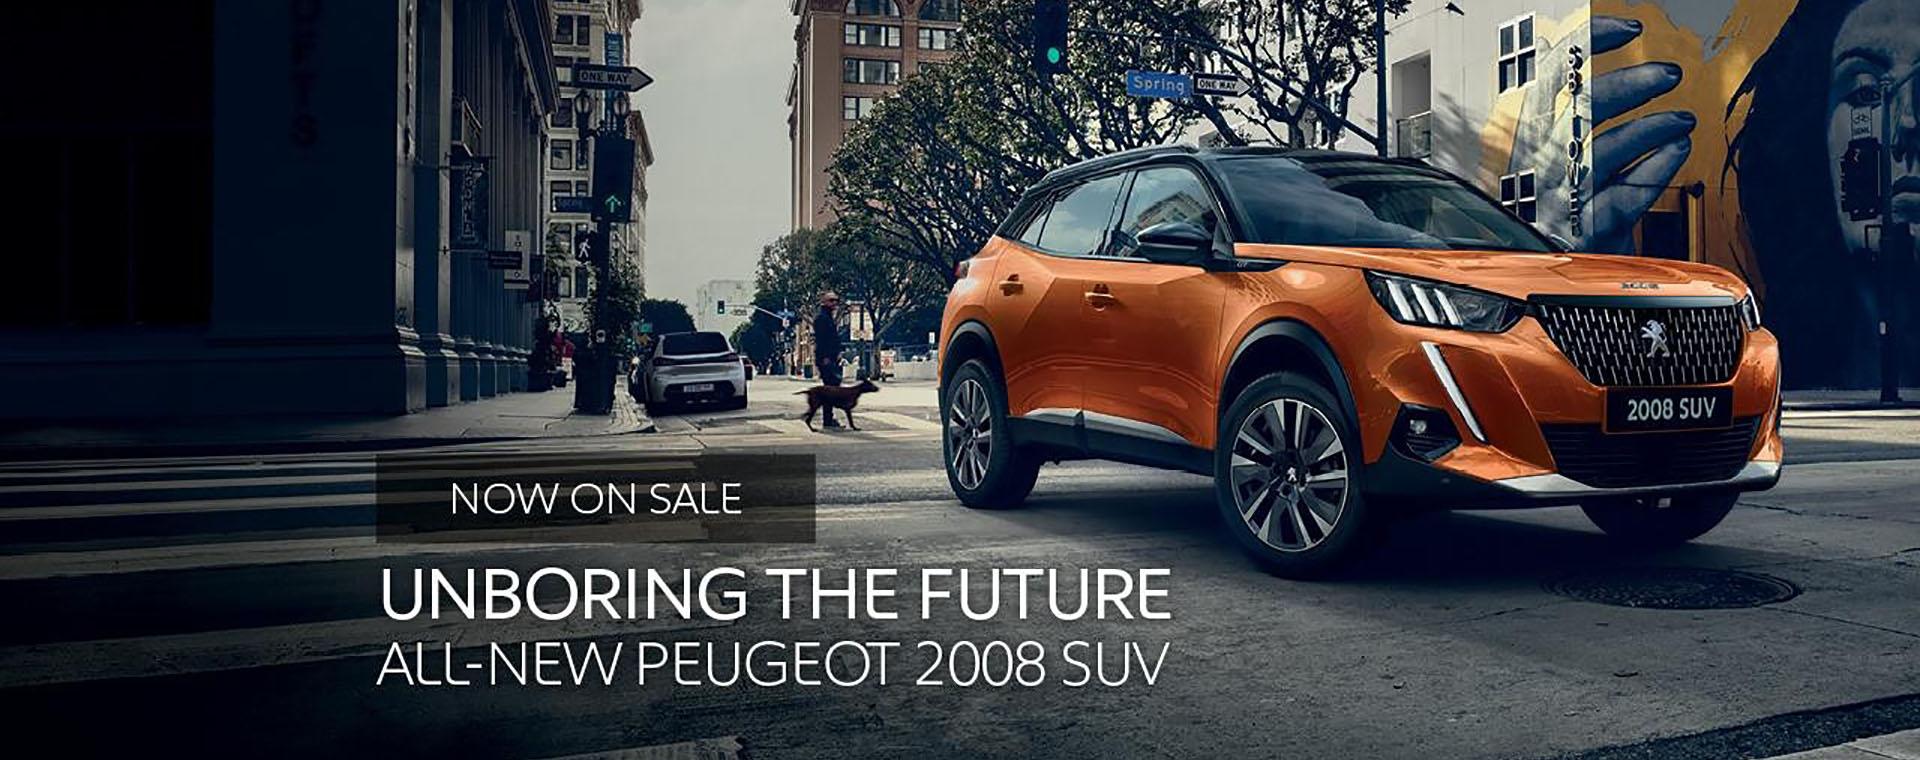 PEUGEOT | All New 2008 SUV